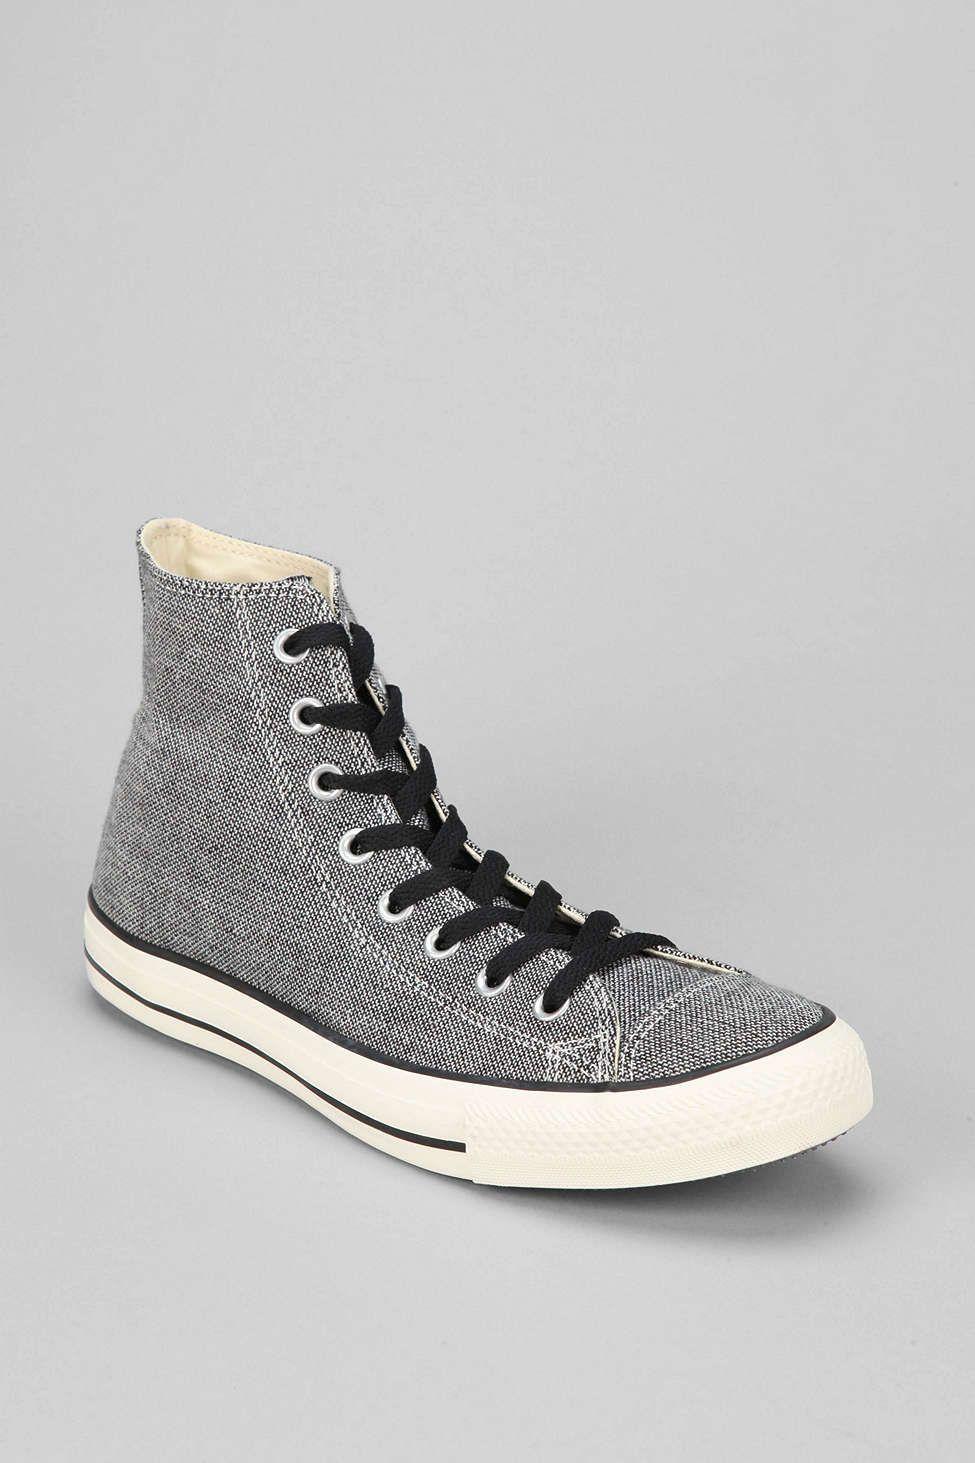 721d29102d73 Converse Chuck Taylor All Star Woven High-Top Mens Sneaker - Urban  Outfitters